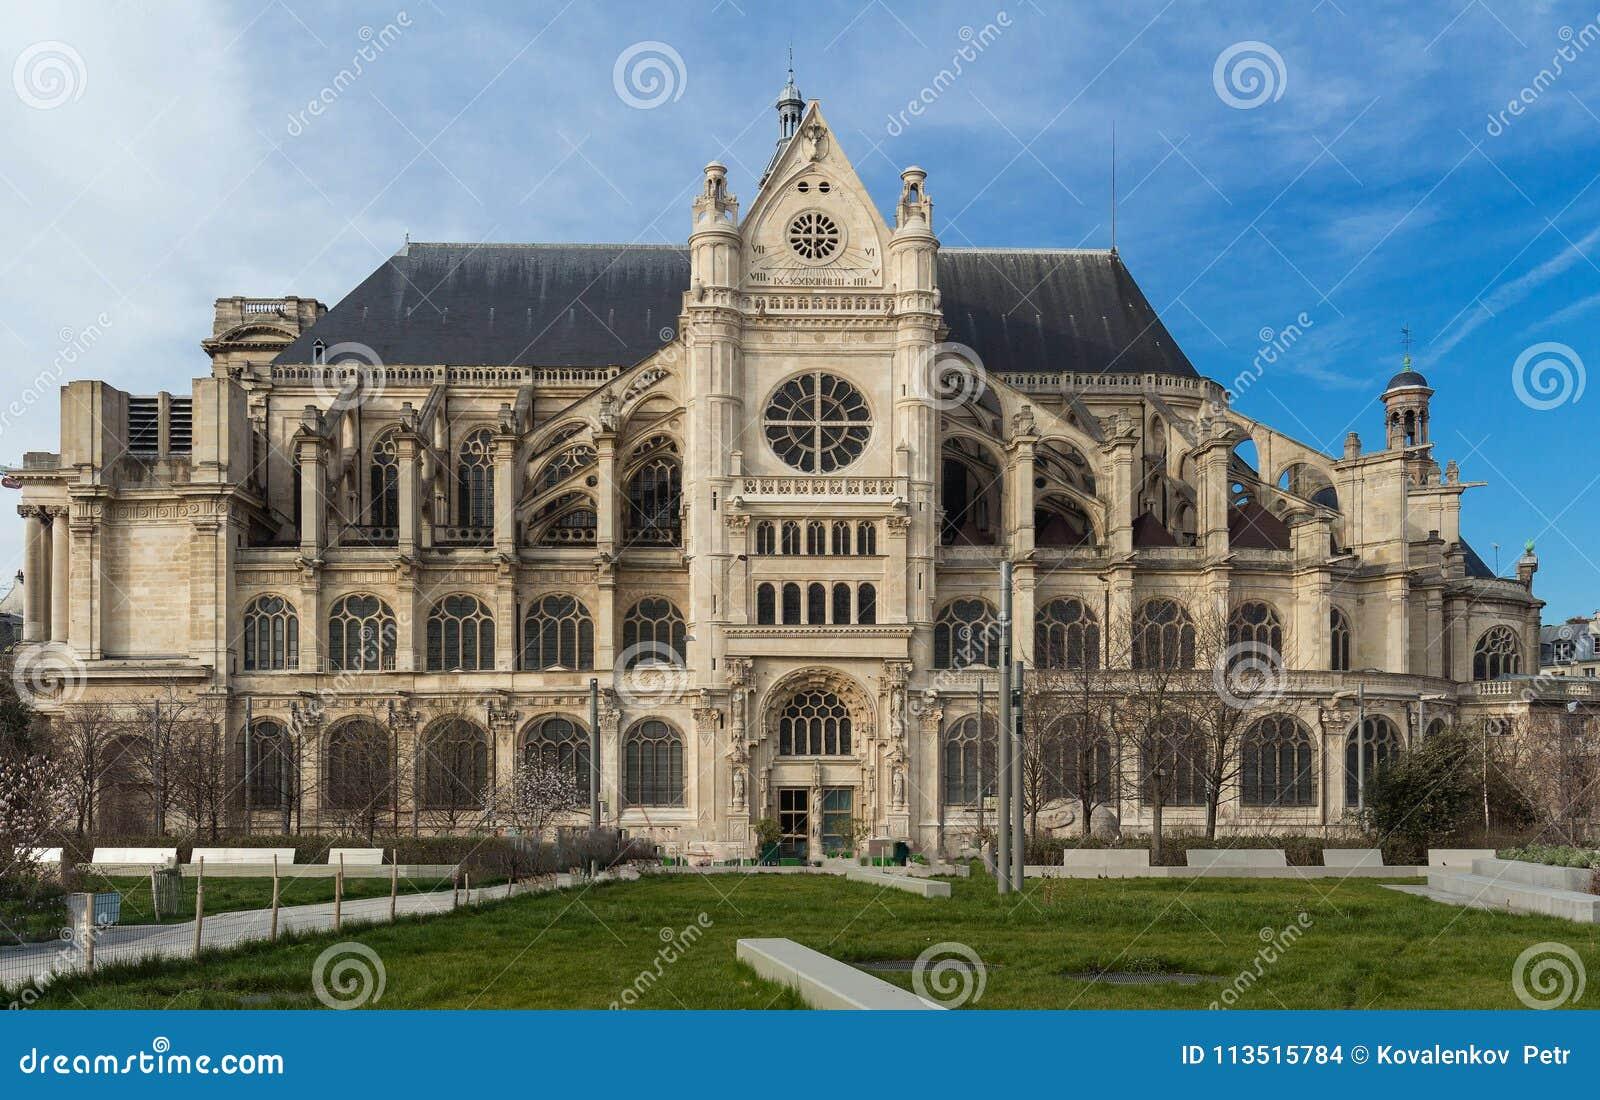 Basilica of Saint Clotilde , Paris, France.